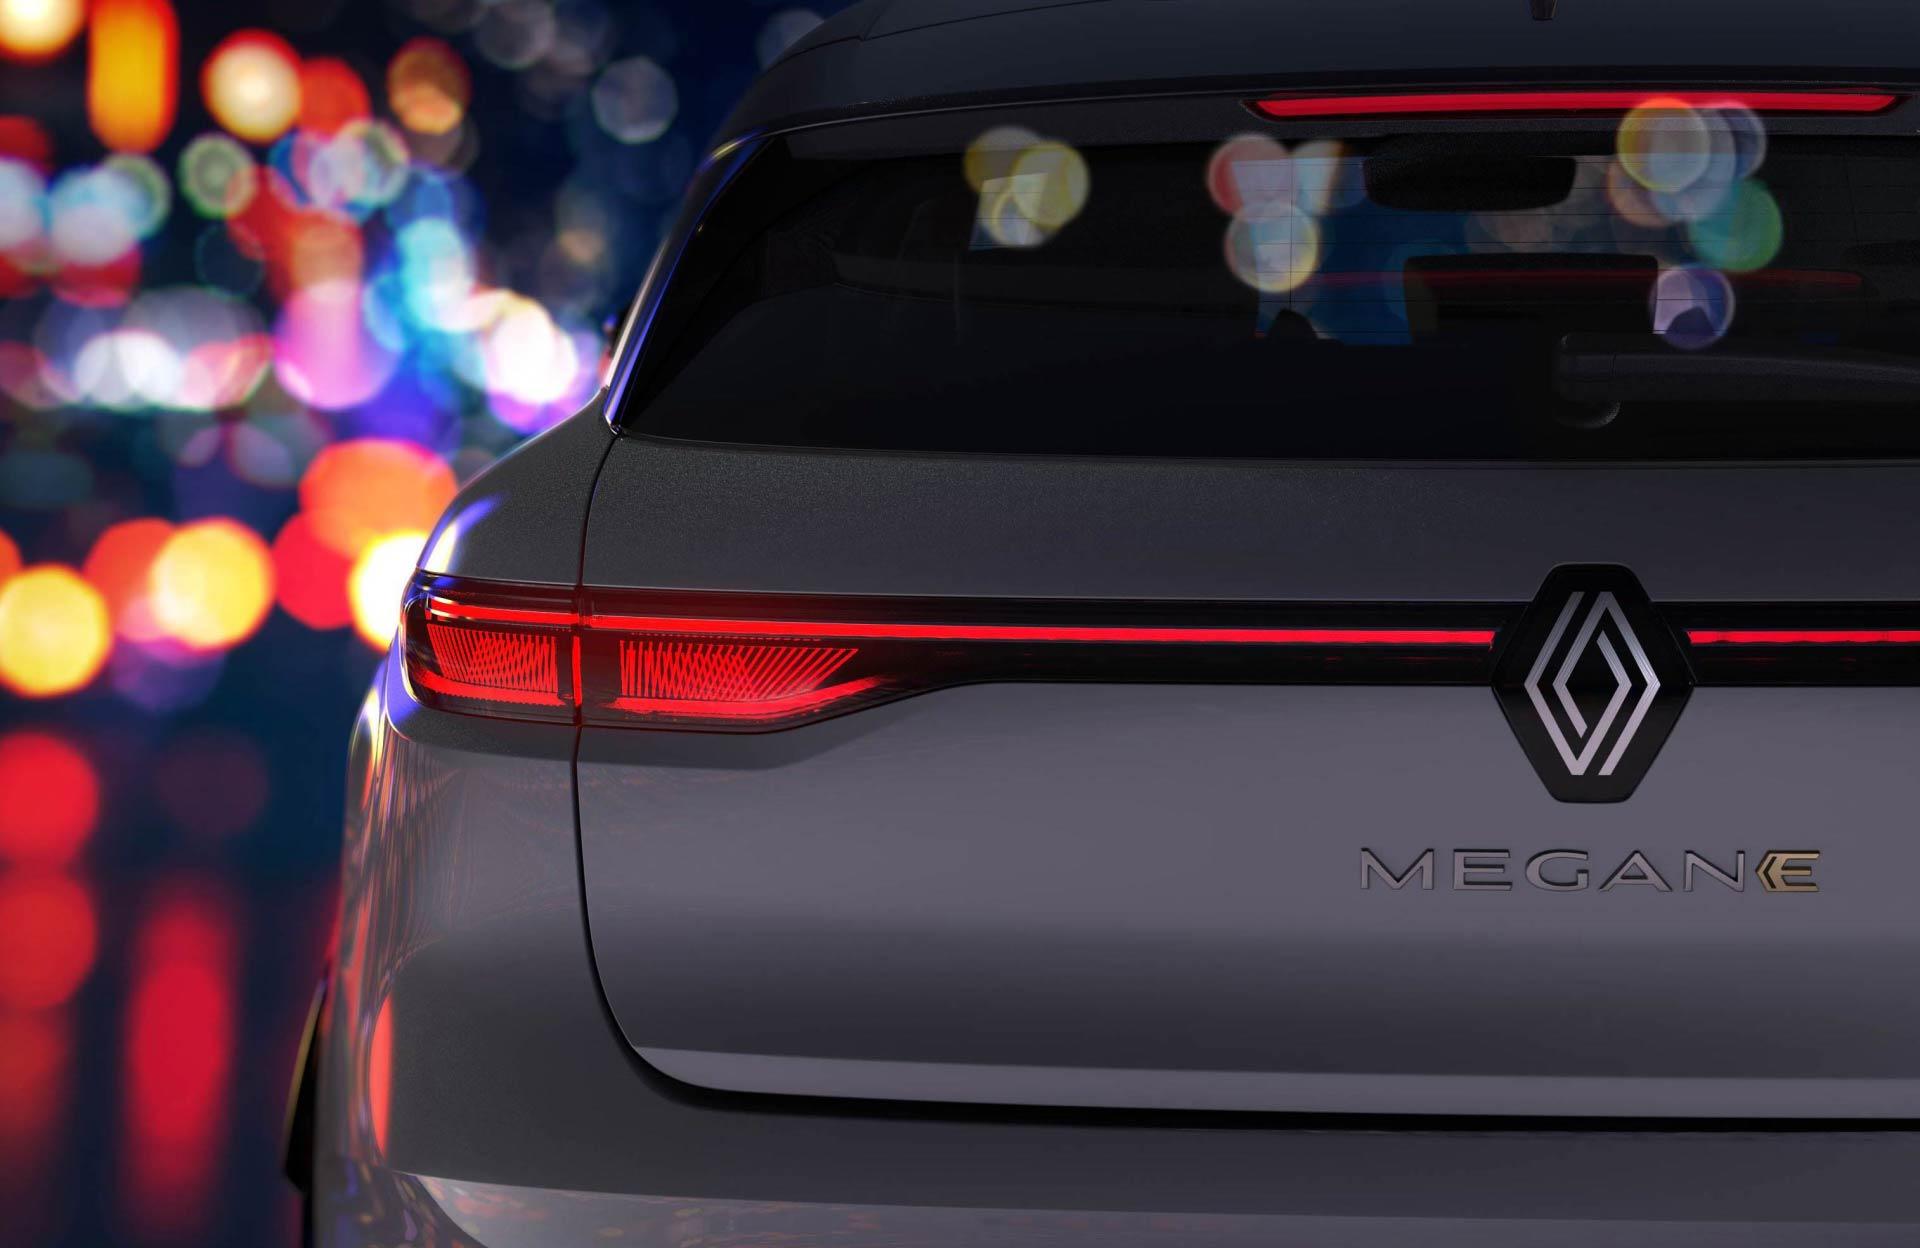 Renault Megane elettrica, le immagini teaser ed esordio del nuovo logo